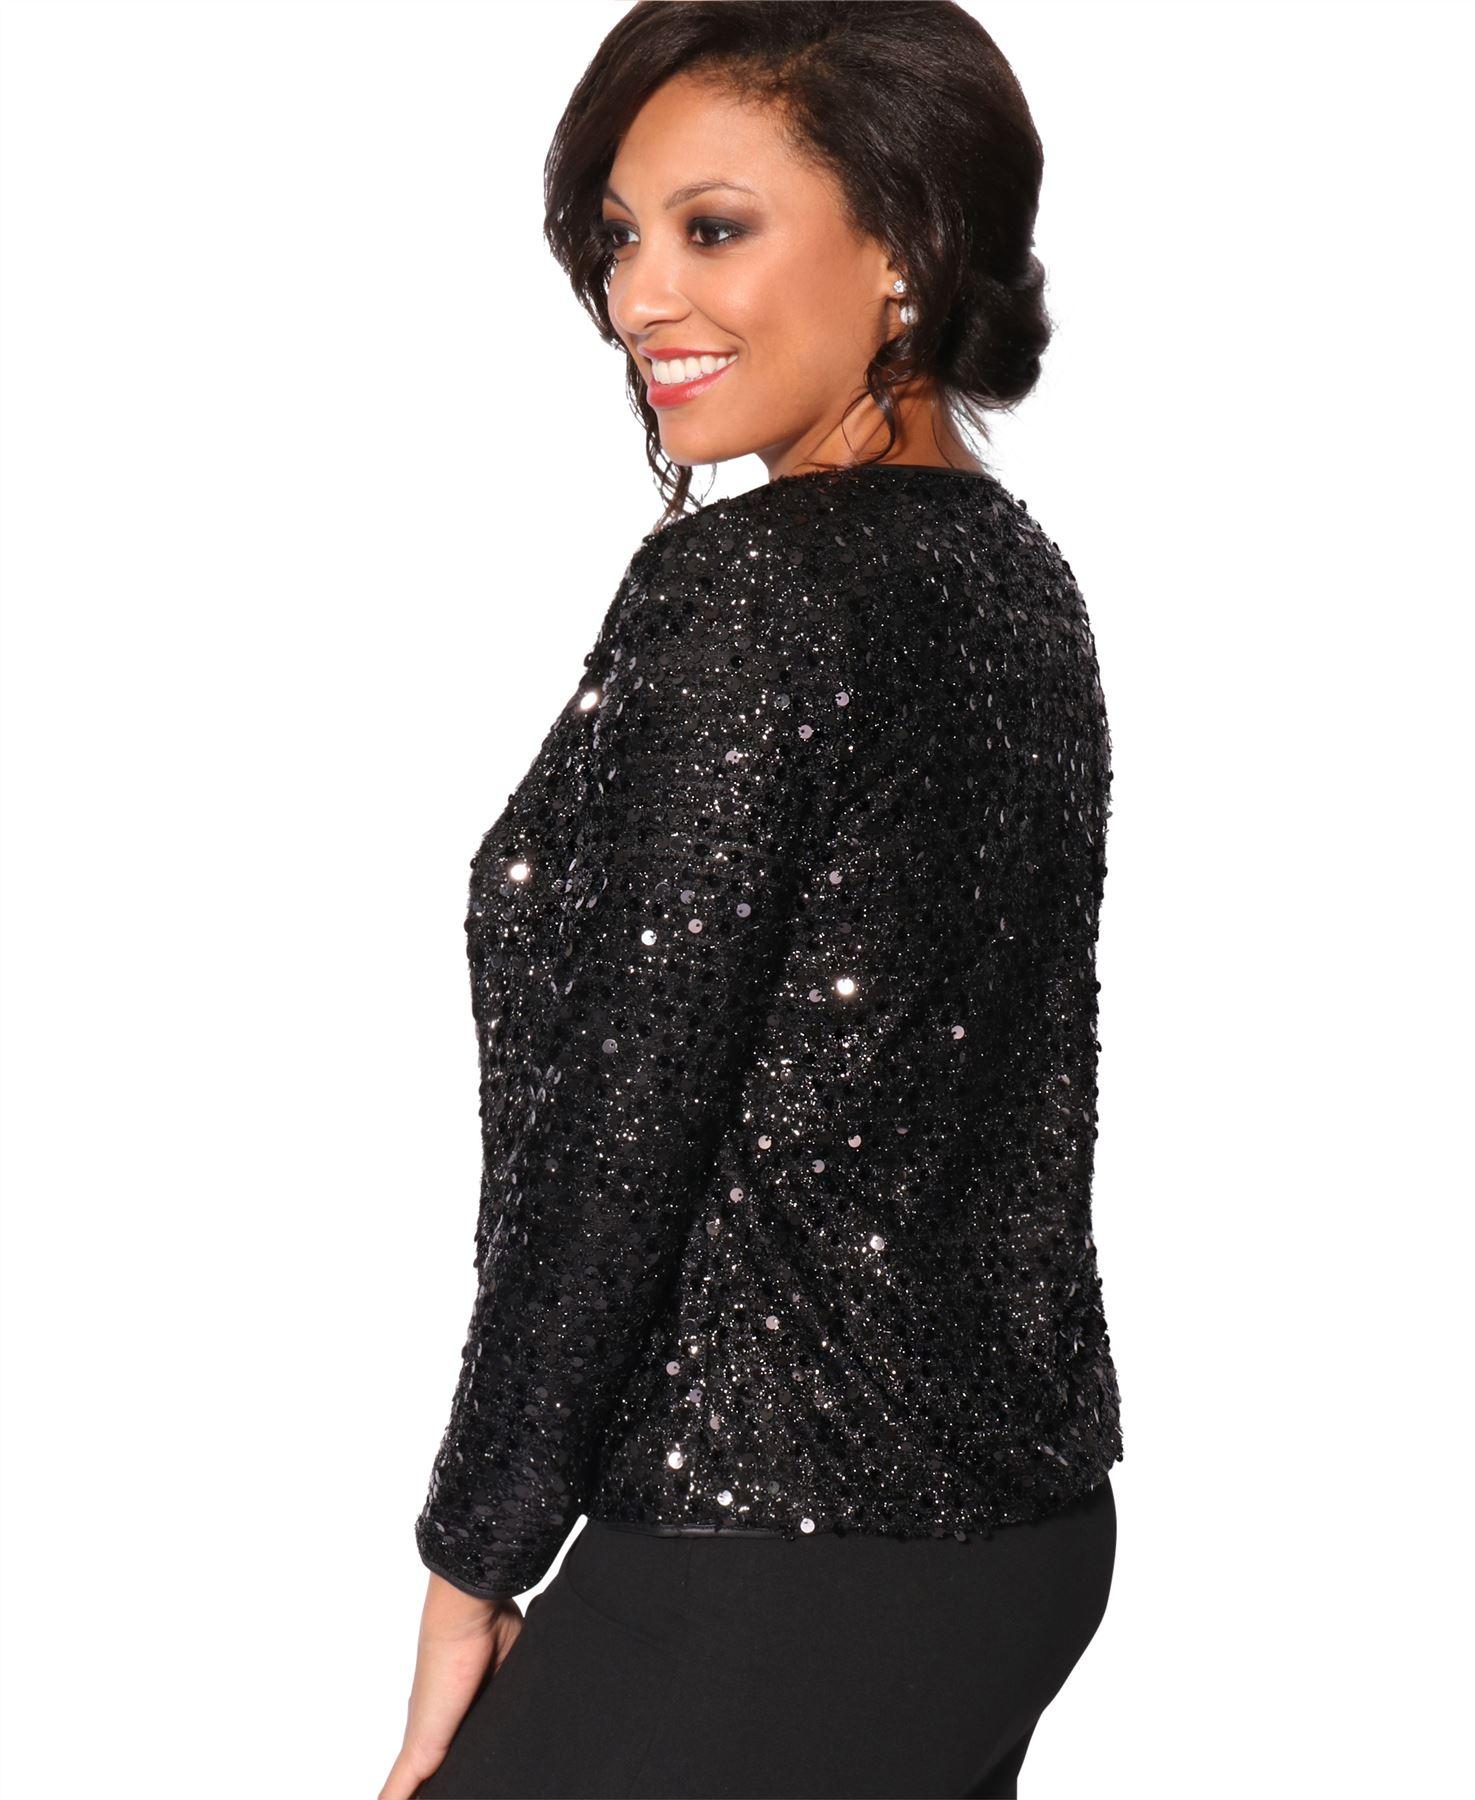 Womens-Sequin-Shrug-Bolero-Cropped-Top-Jacket-Blazer-Party-Evening-Coat thumbnail 7